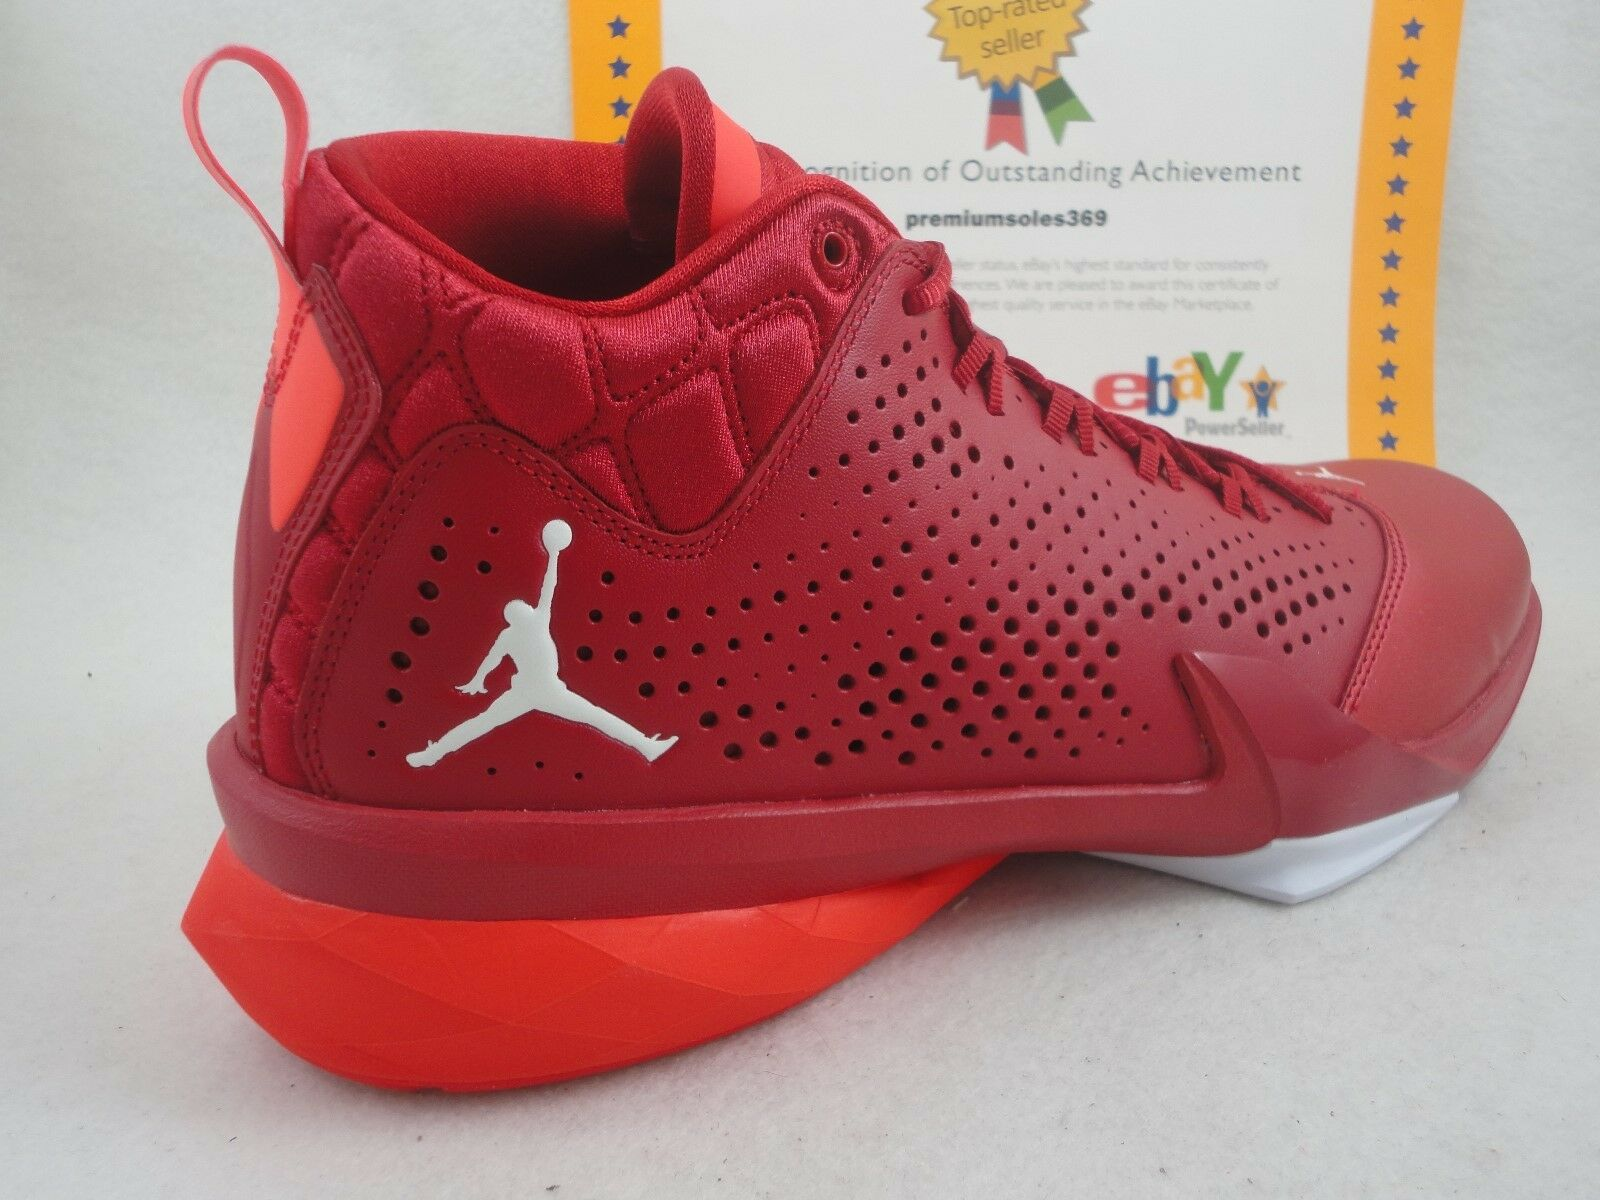 Nike Jordan Flight Time 14,5, gimnasio Rojo / blanco 23 / infrarrojo Lunarlon, tamaño 23 blanco 63274d